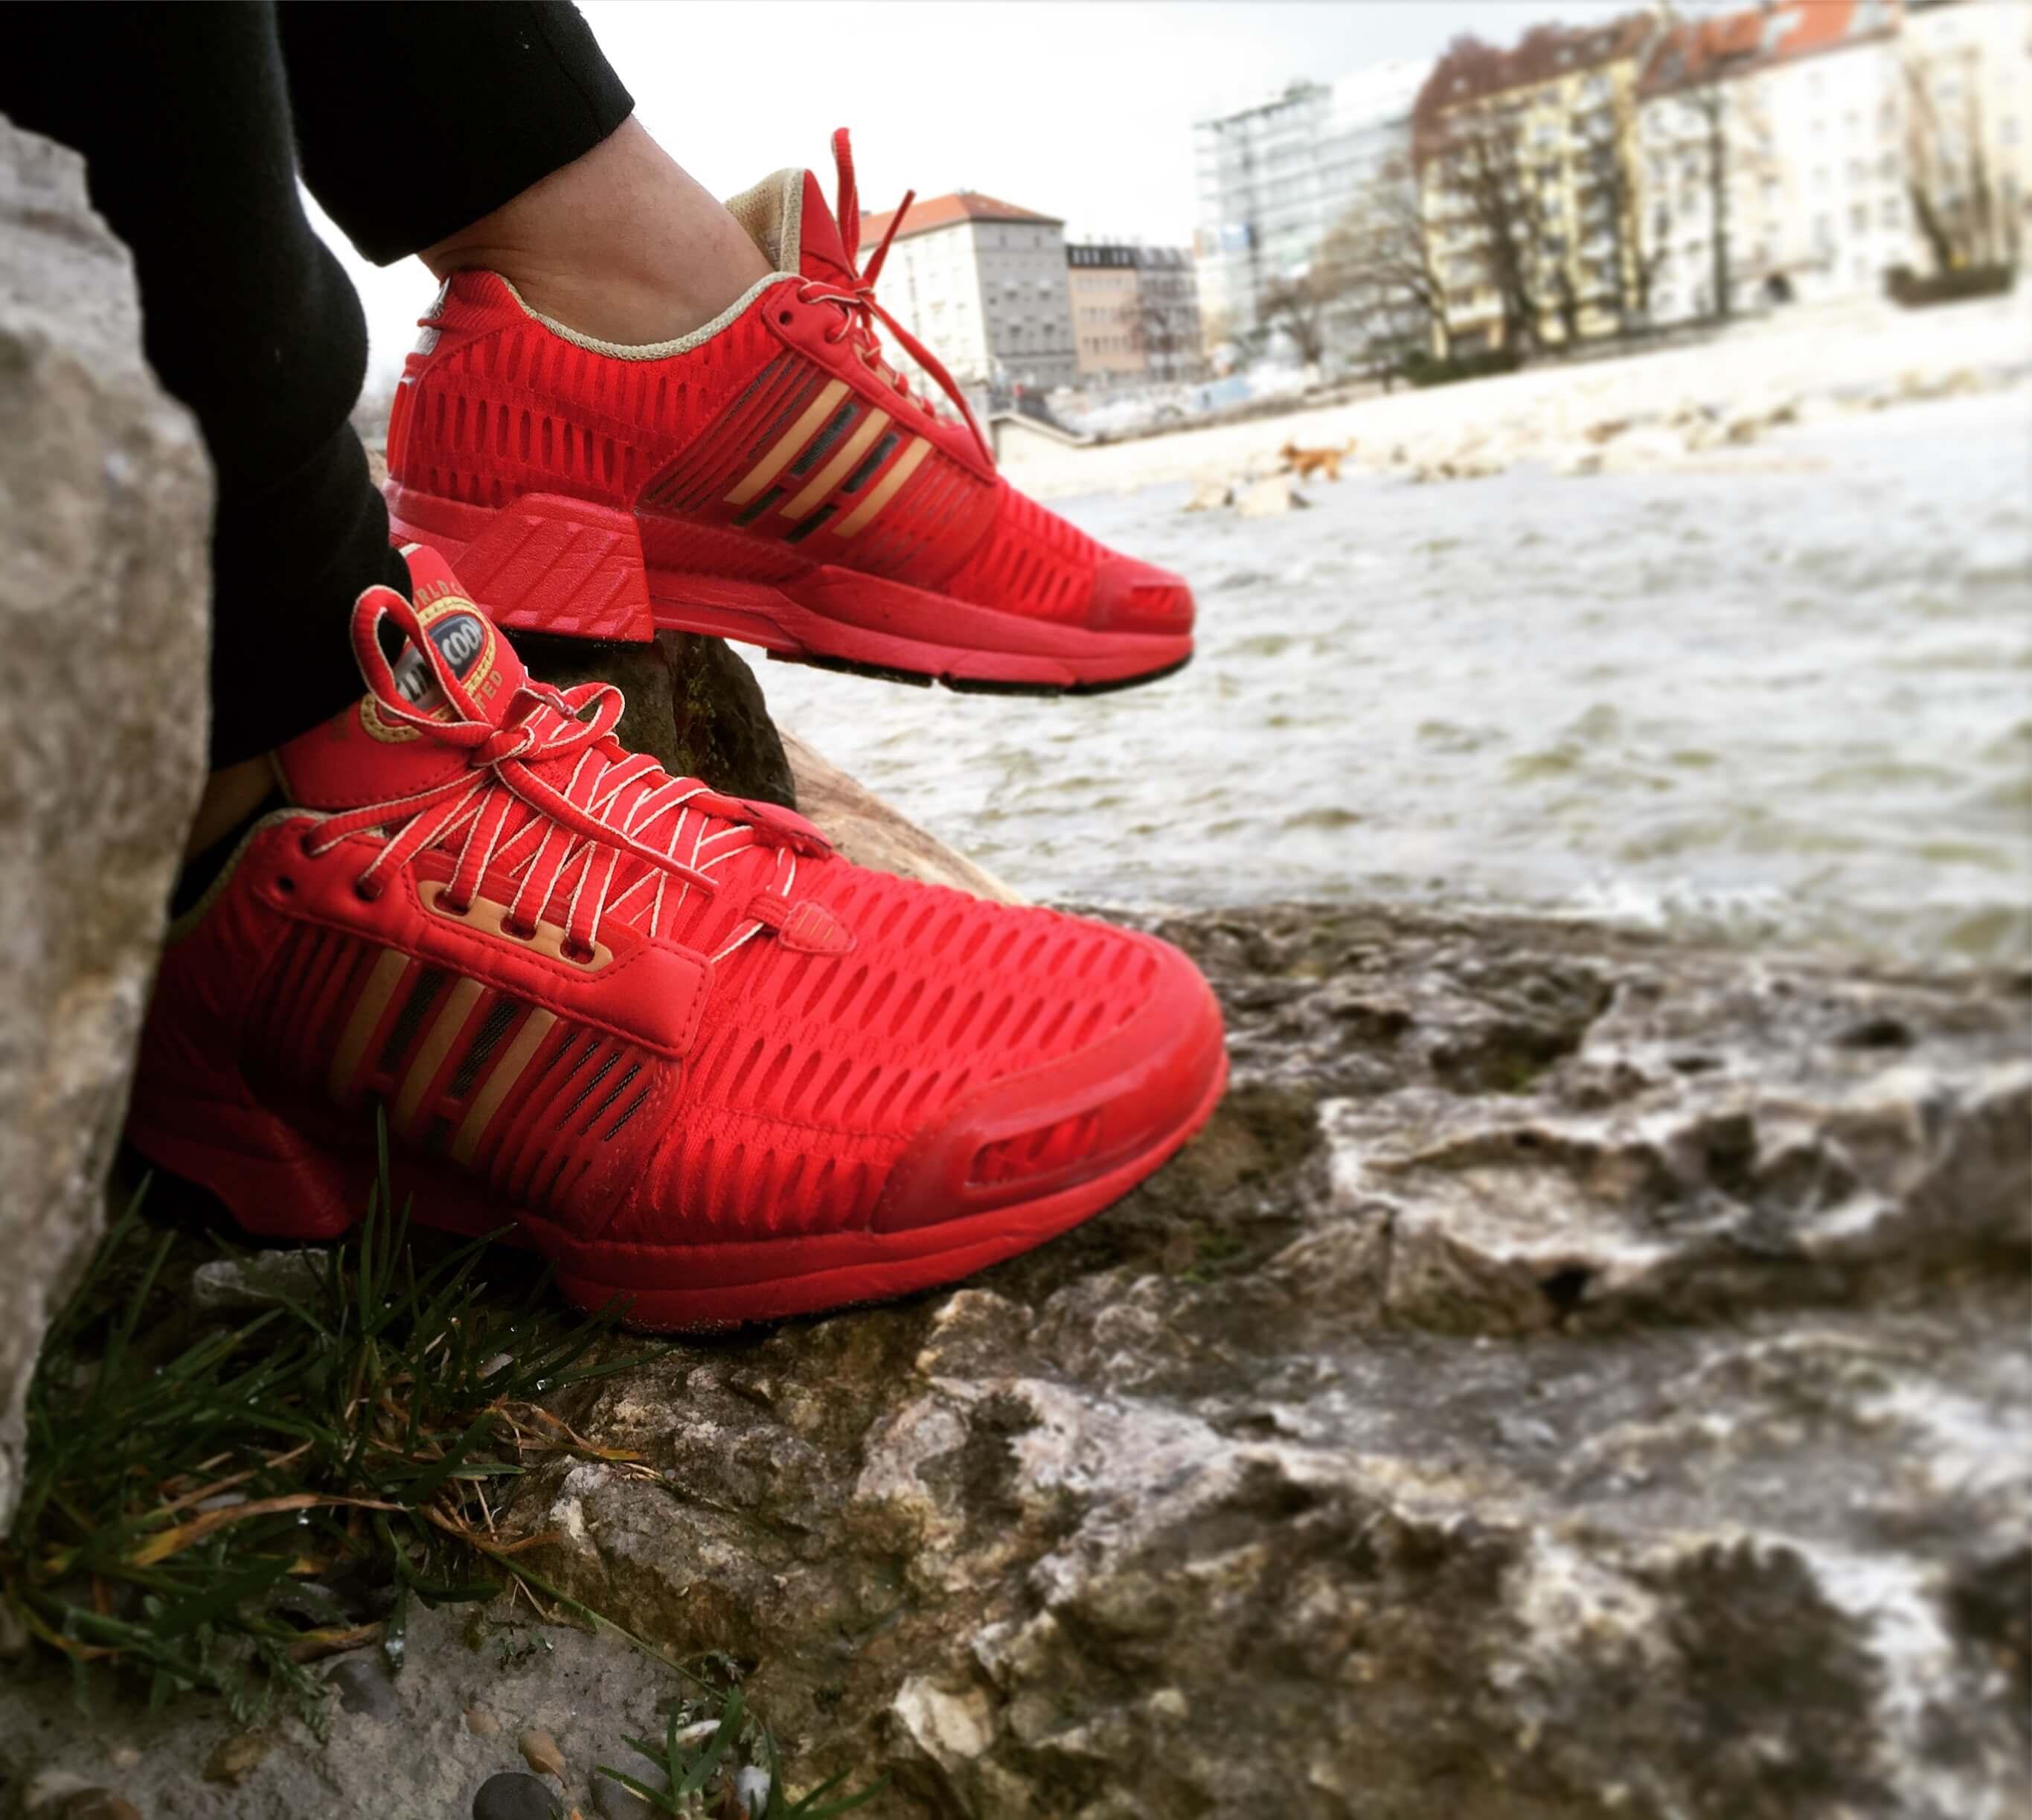 Adidas-ClimaCool-Coca-Cola-Action-Shot-Benstah-Onfeet